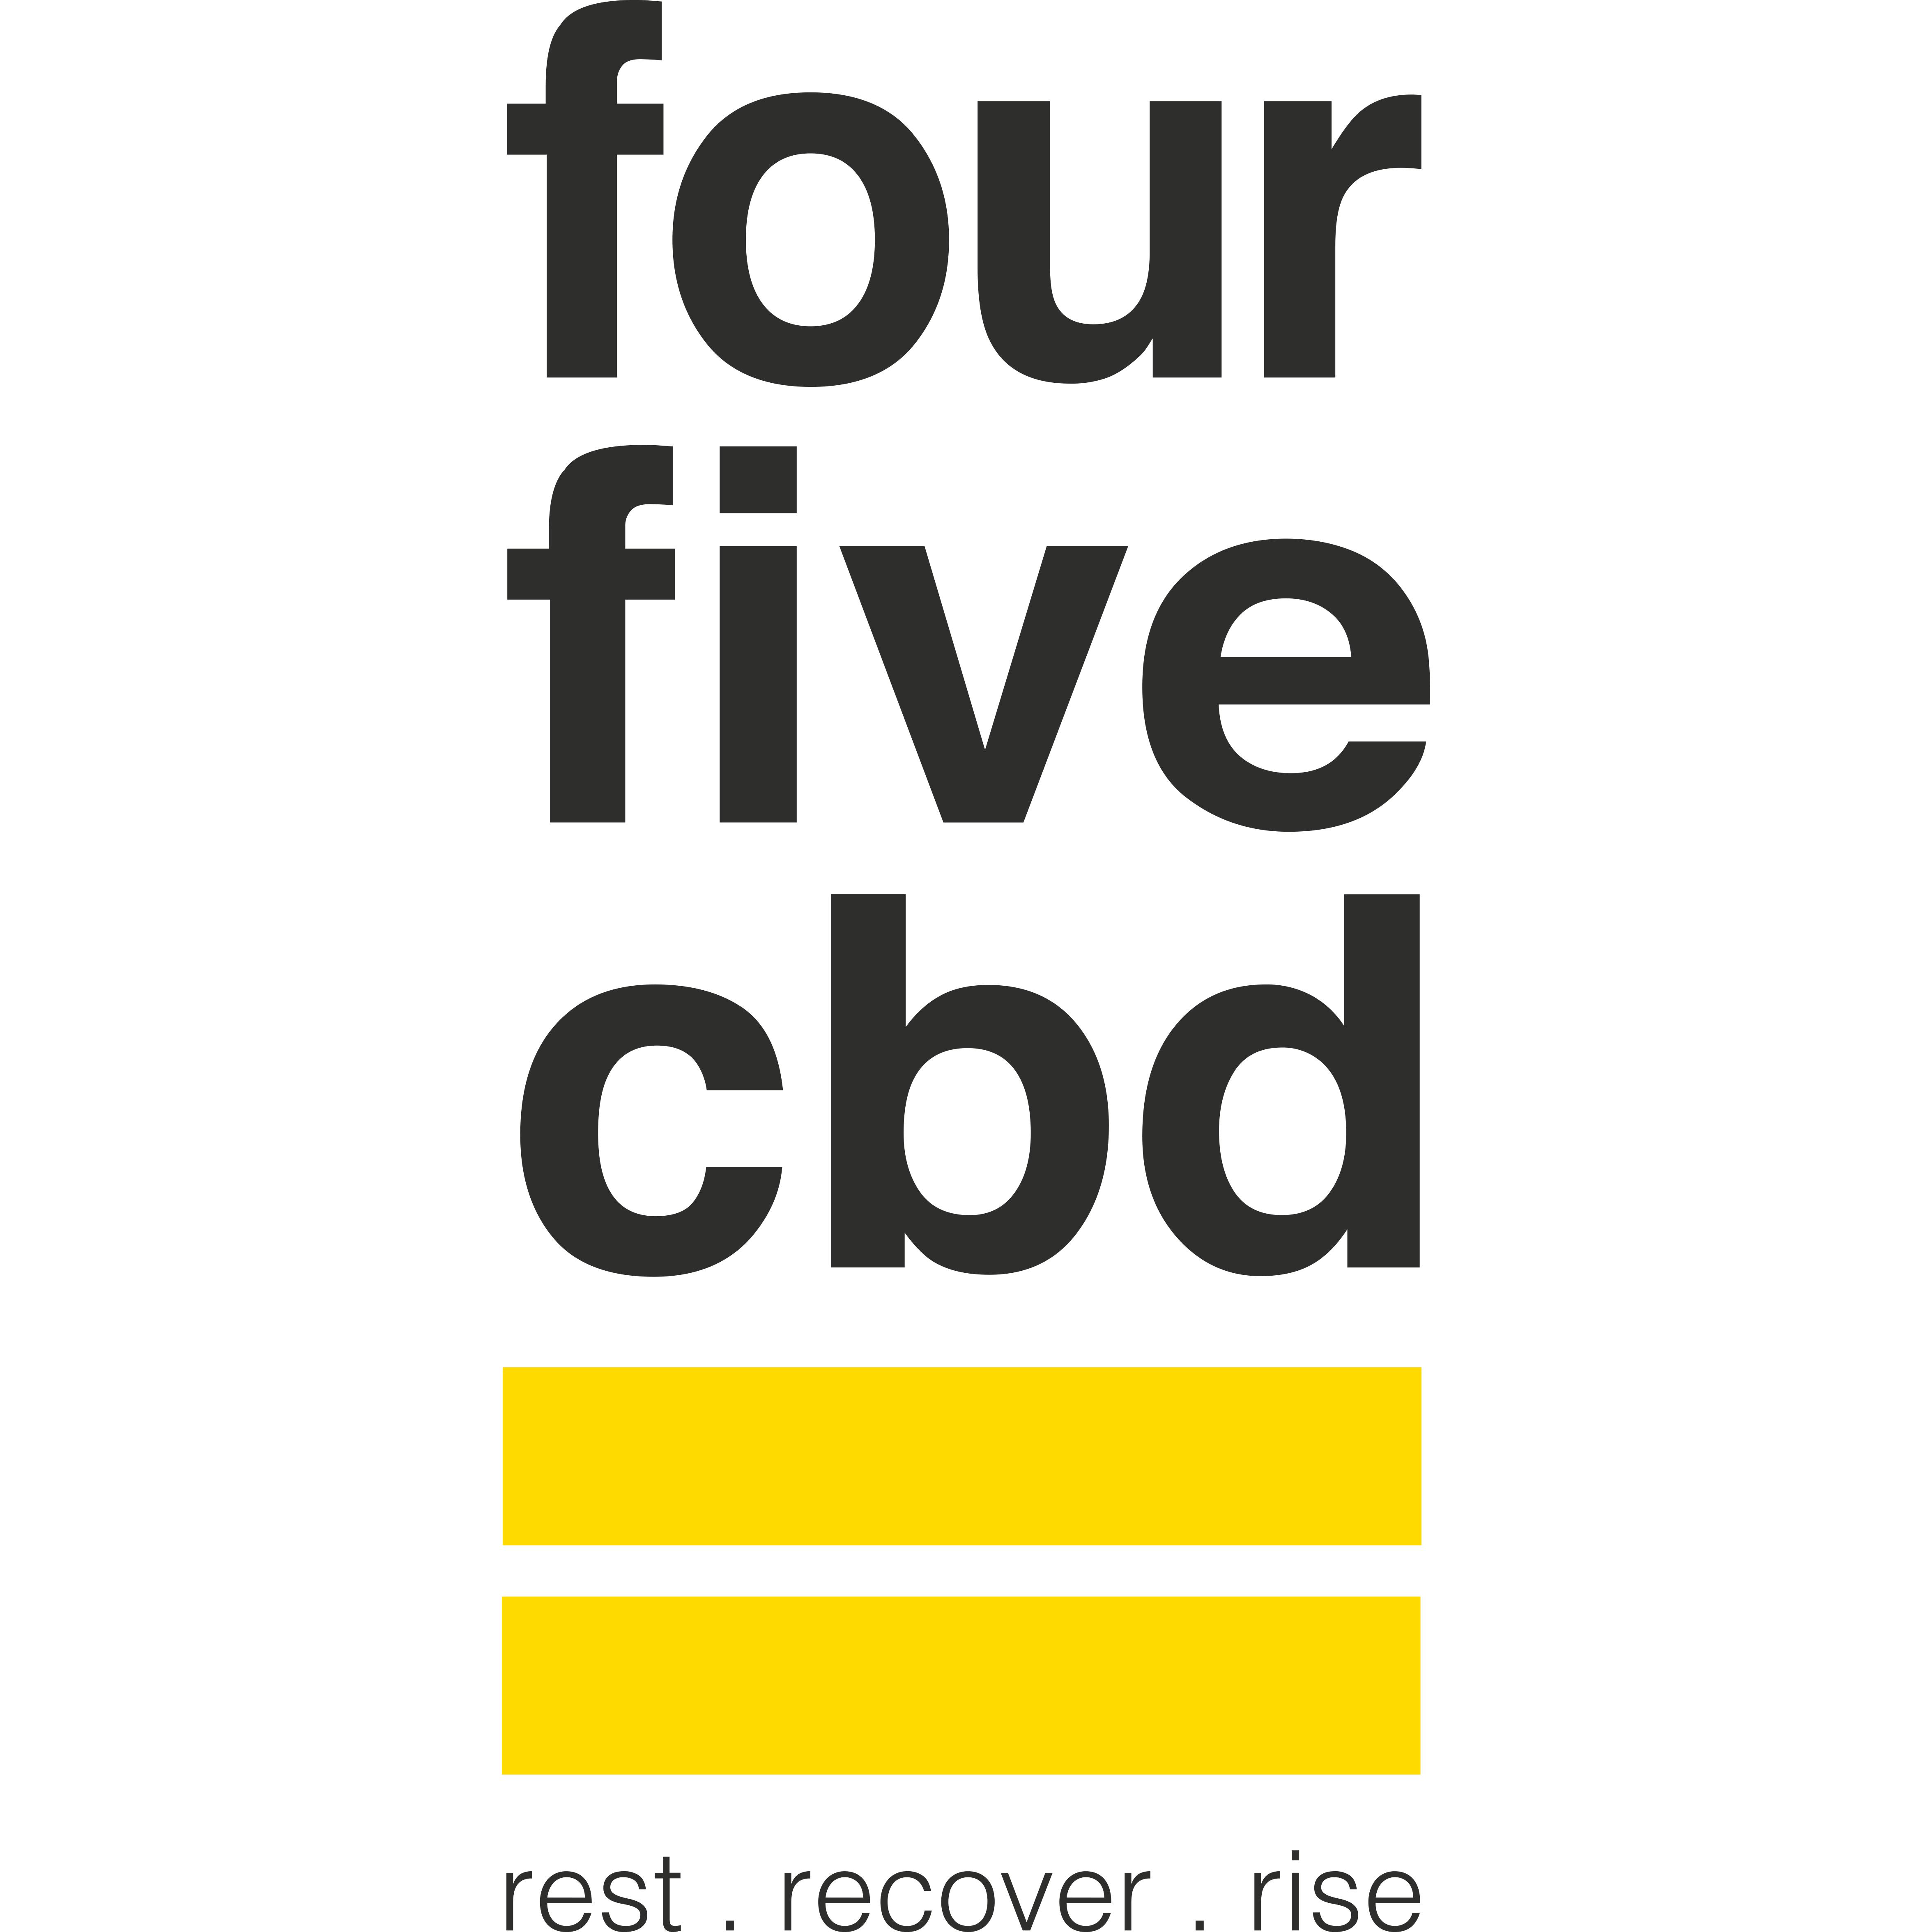 Shop Fourfive CBD